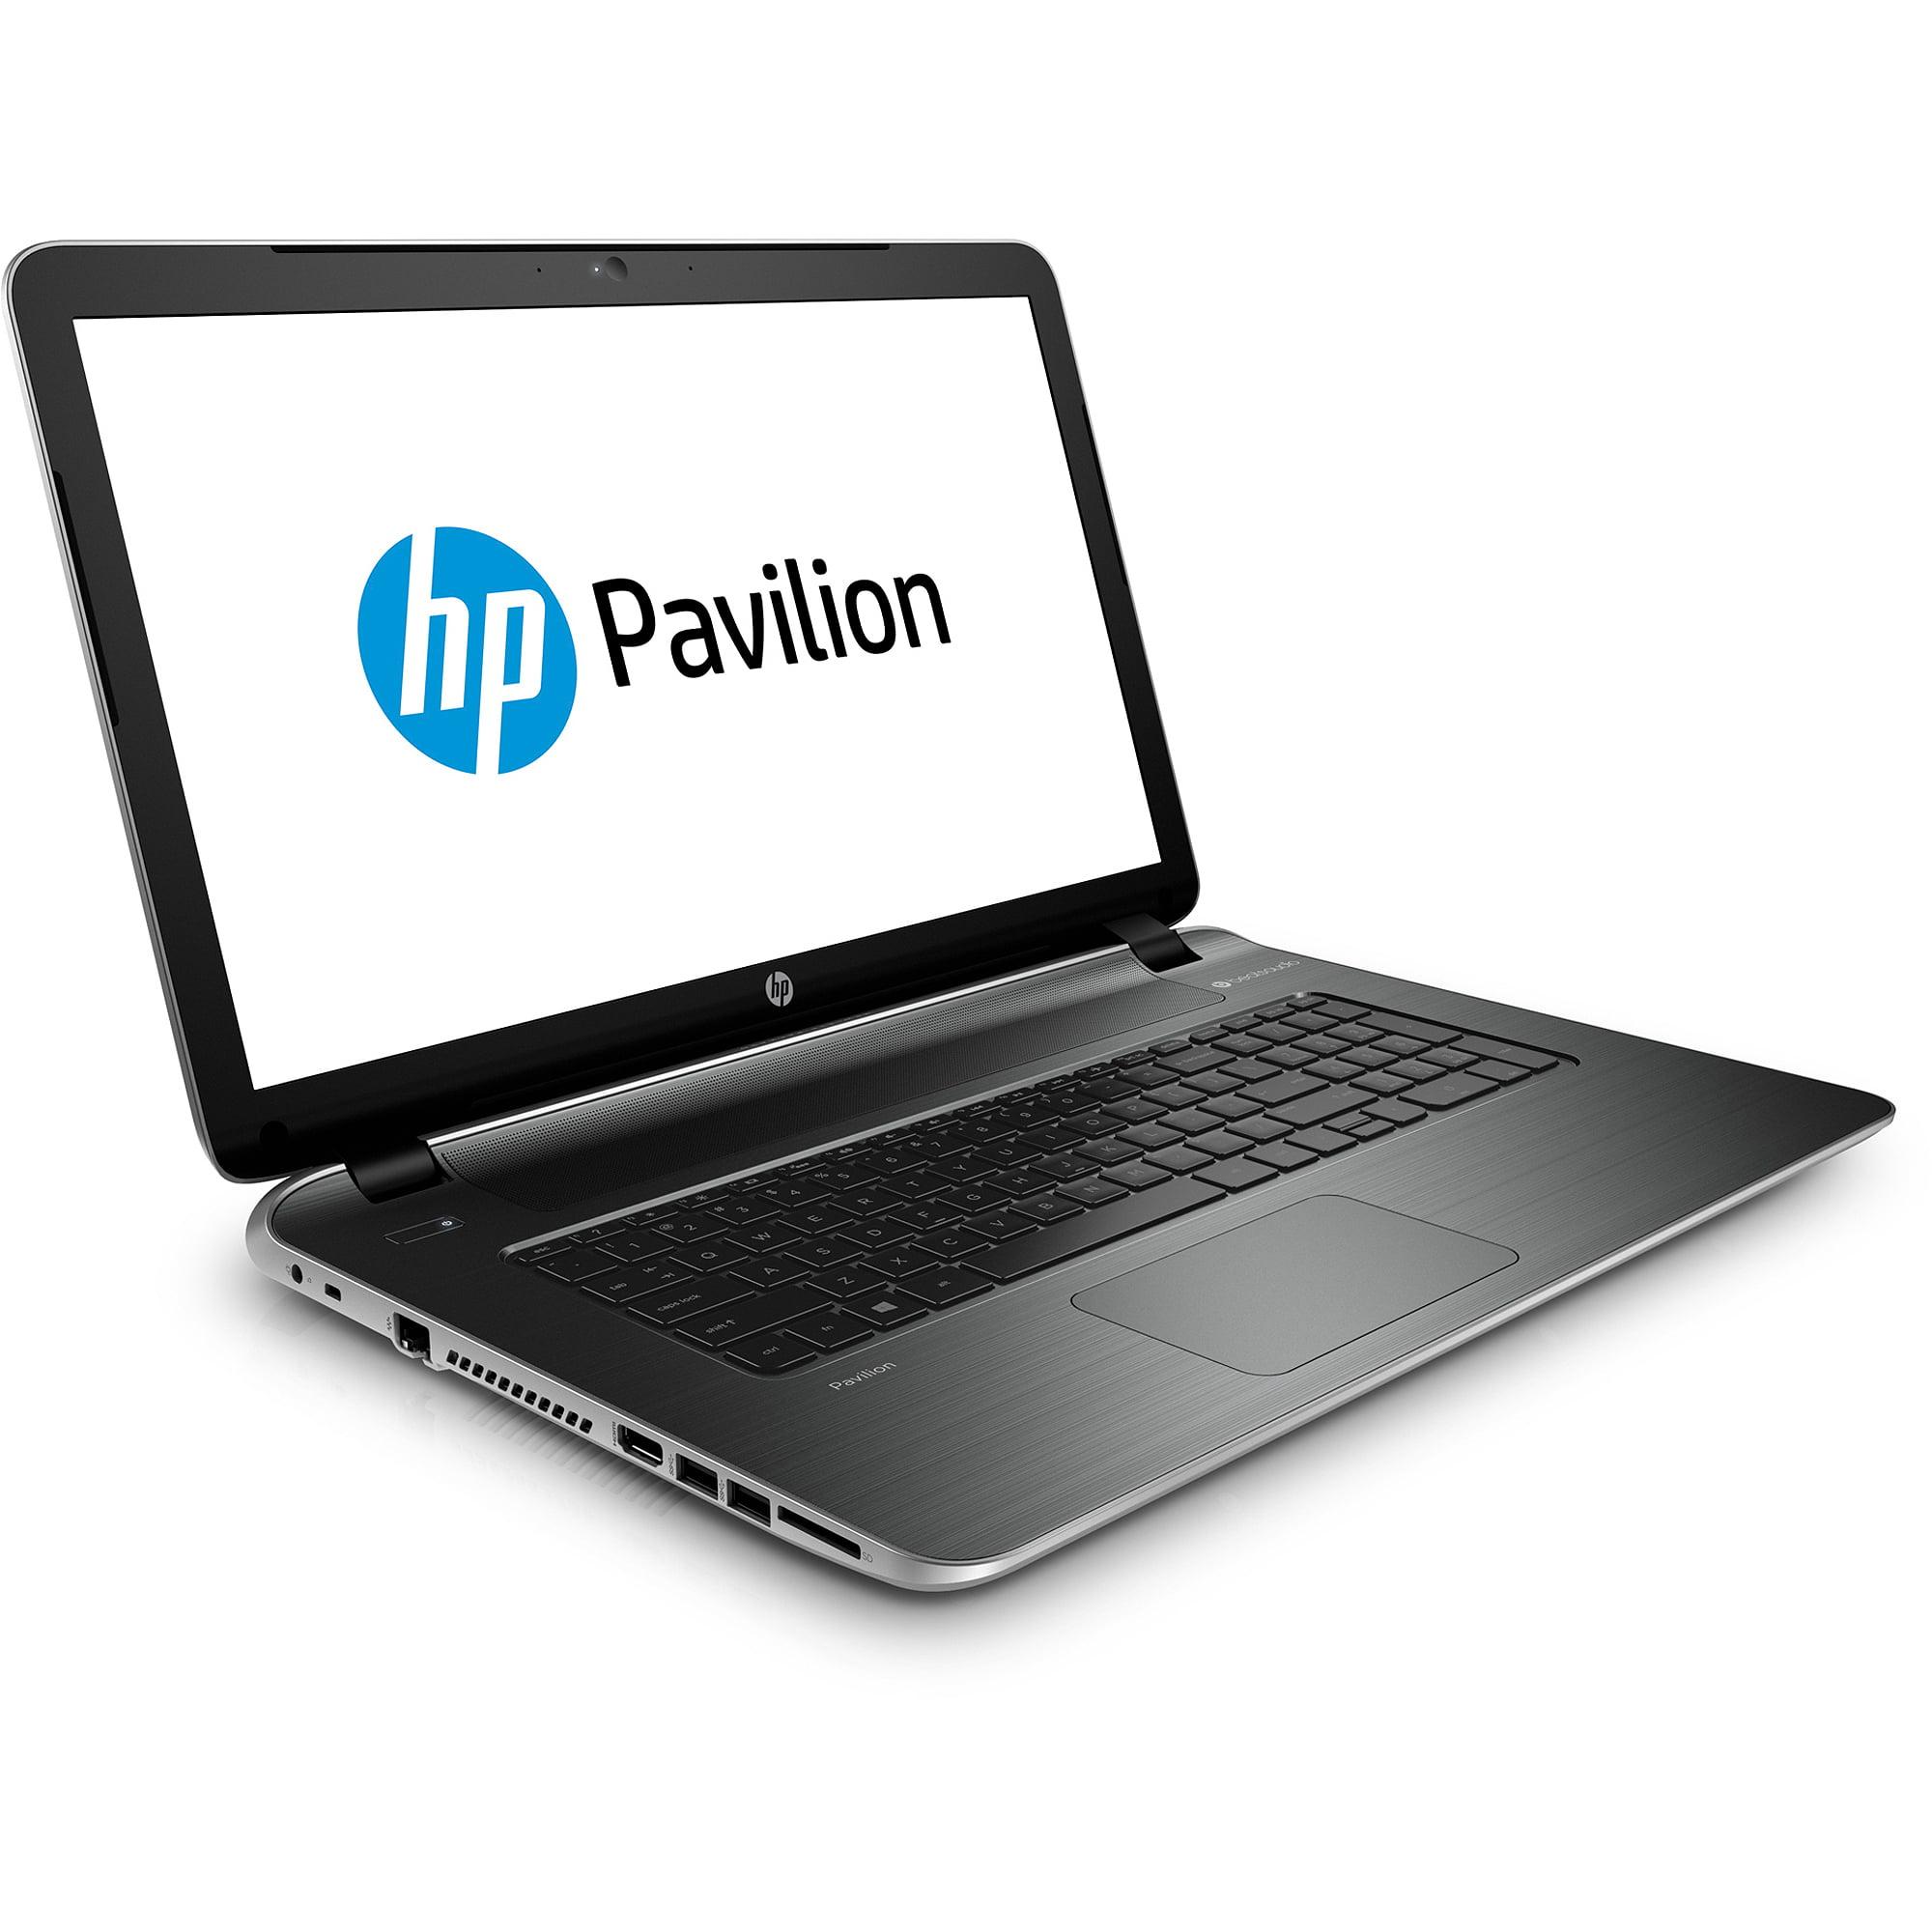 Hp notebook laptop windows 8 - Hp Notebook Laptop Windows 8 26